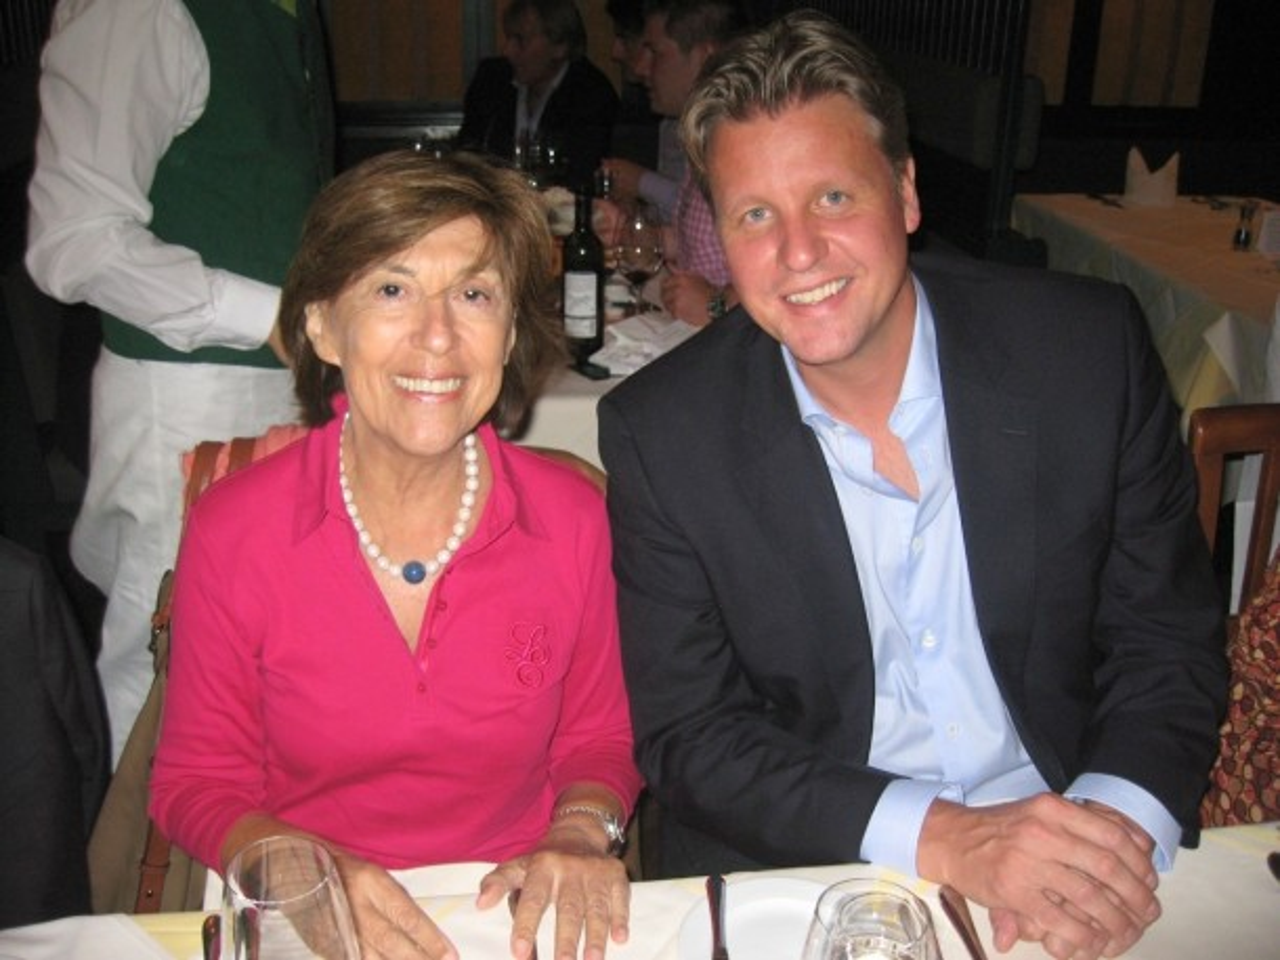 EREN - Diana Morales and Maurice Elst